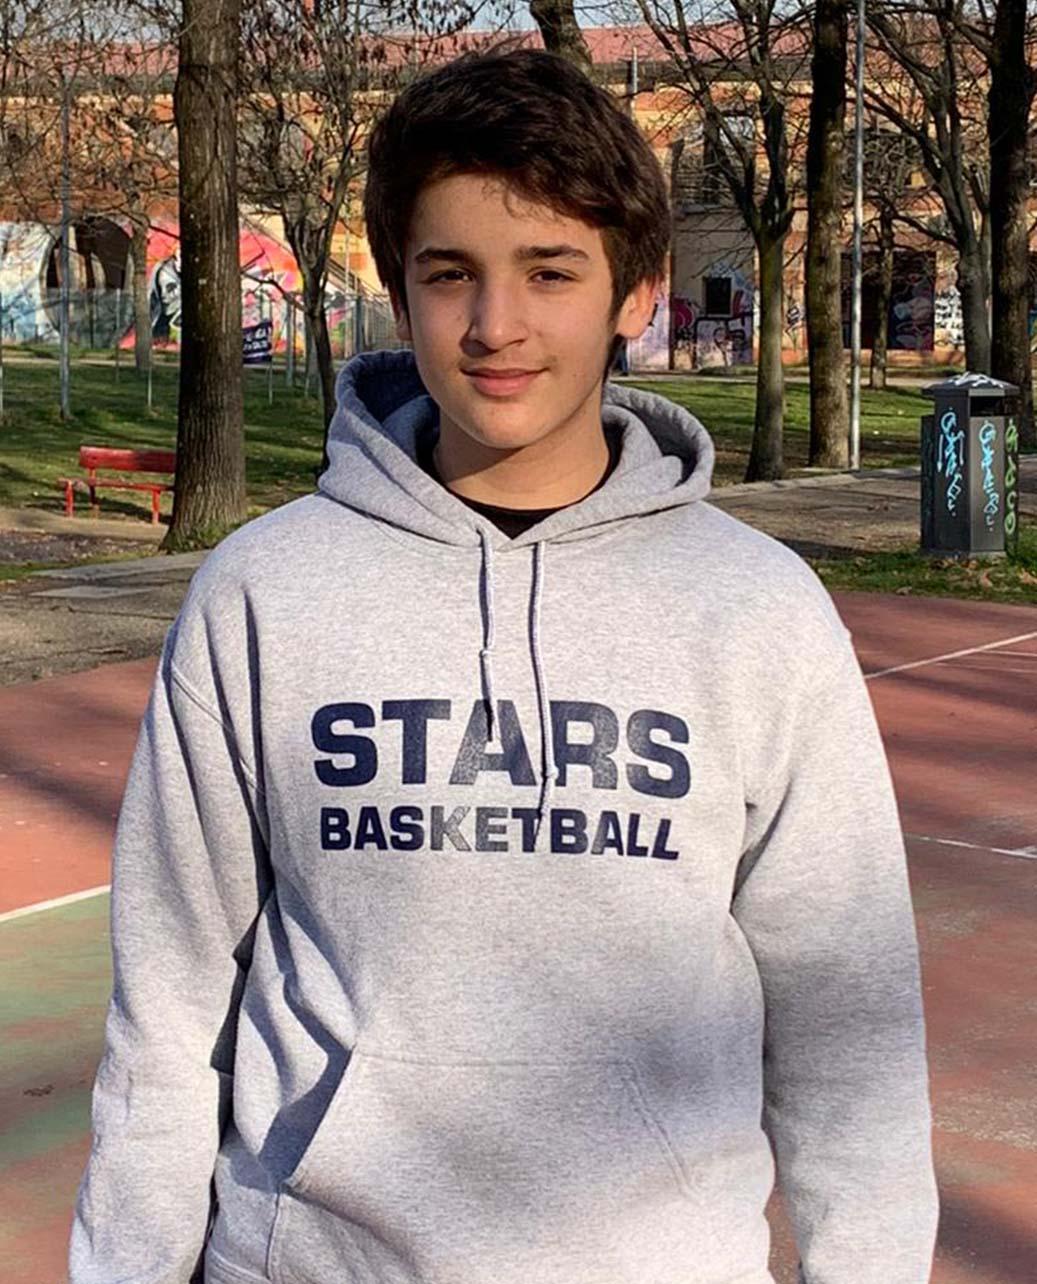 Francesco Mazzavillani - Under 13